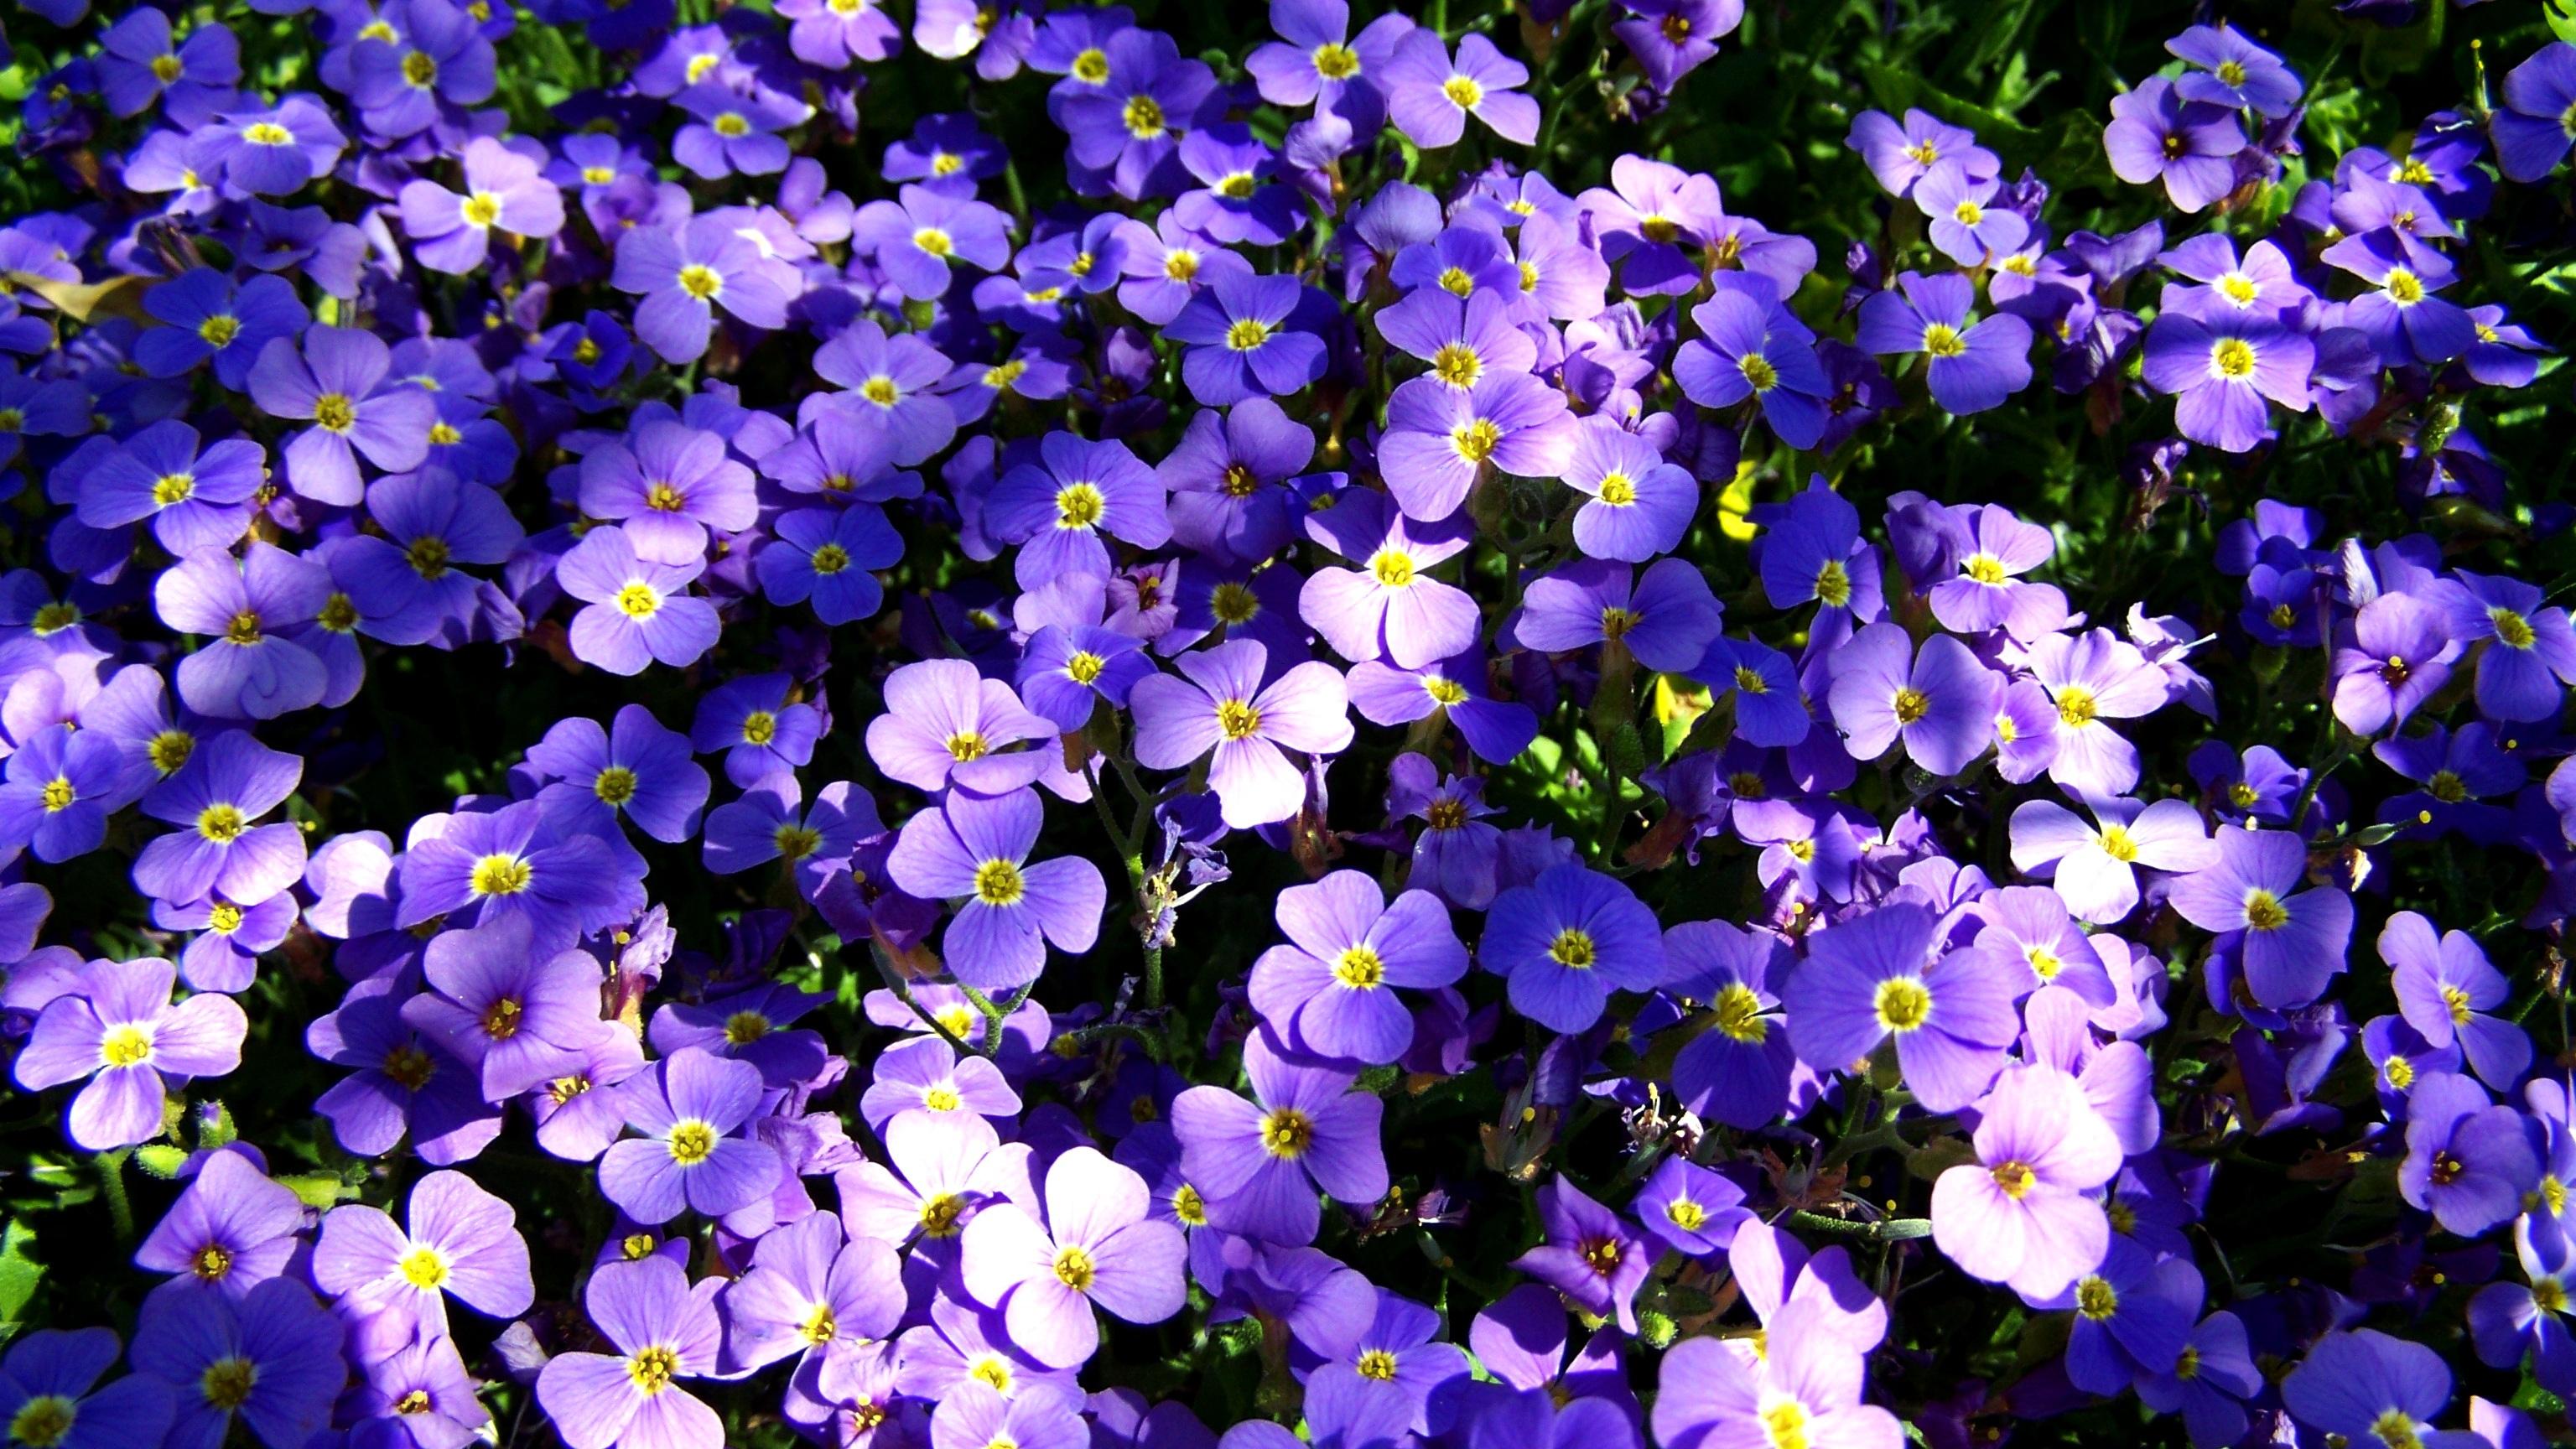 Fotos Gratis : Primavera, Flora, Flor Silvestre, No Me